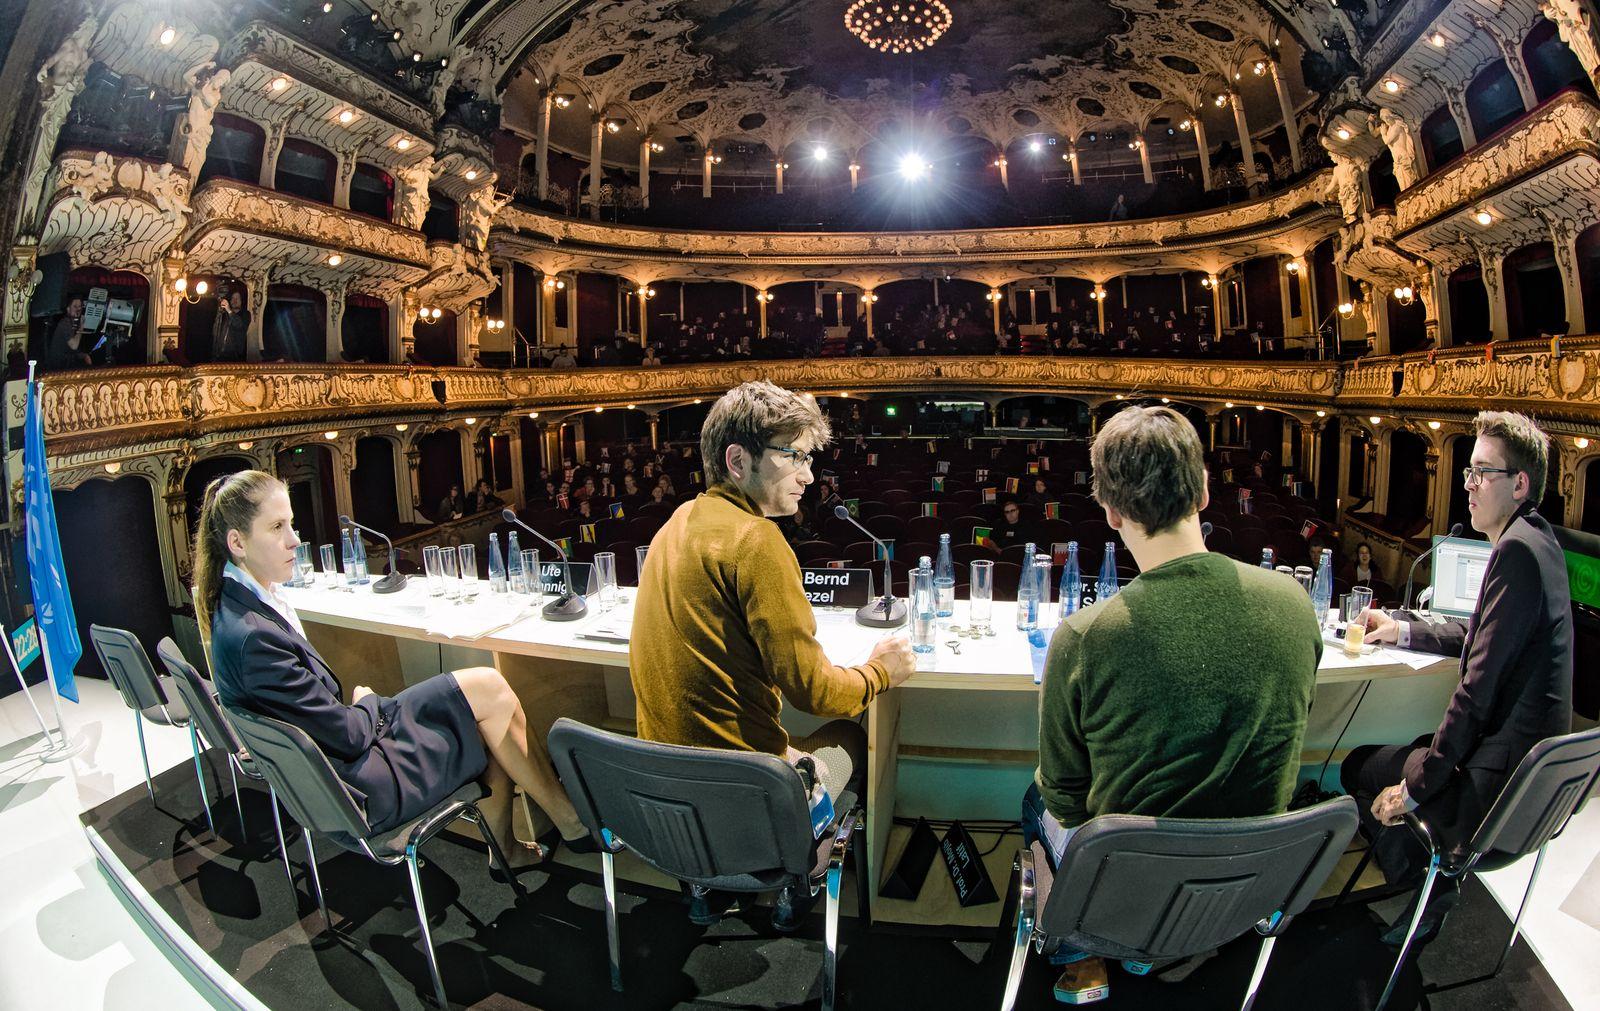 Rimini Protokoll/ Welt-Klimakonferenz